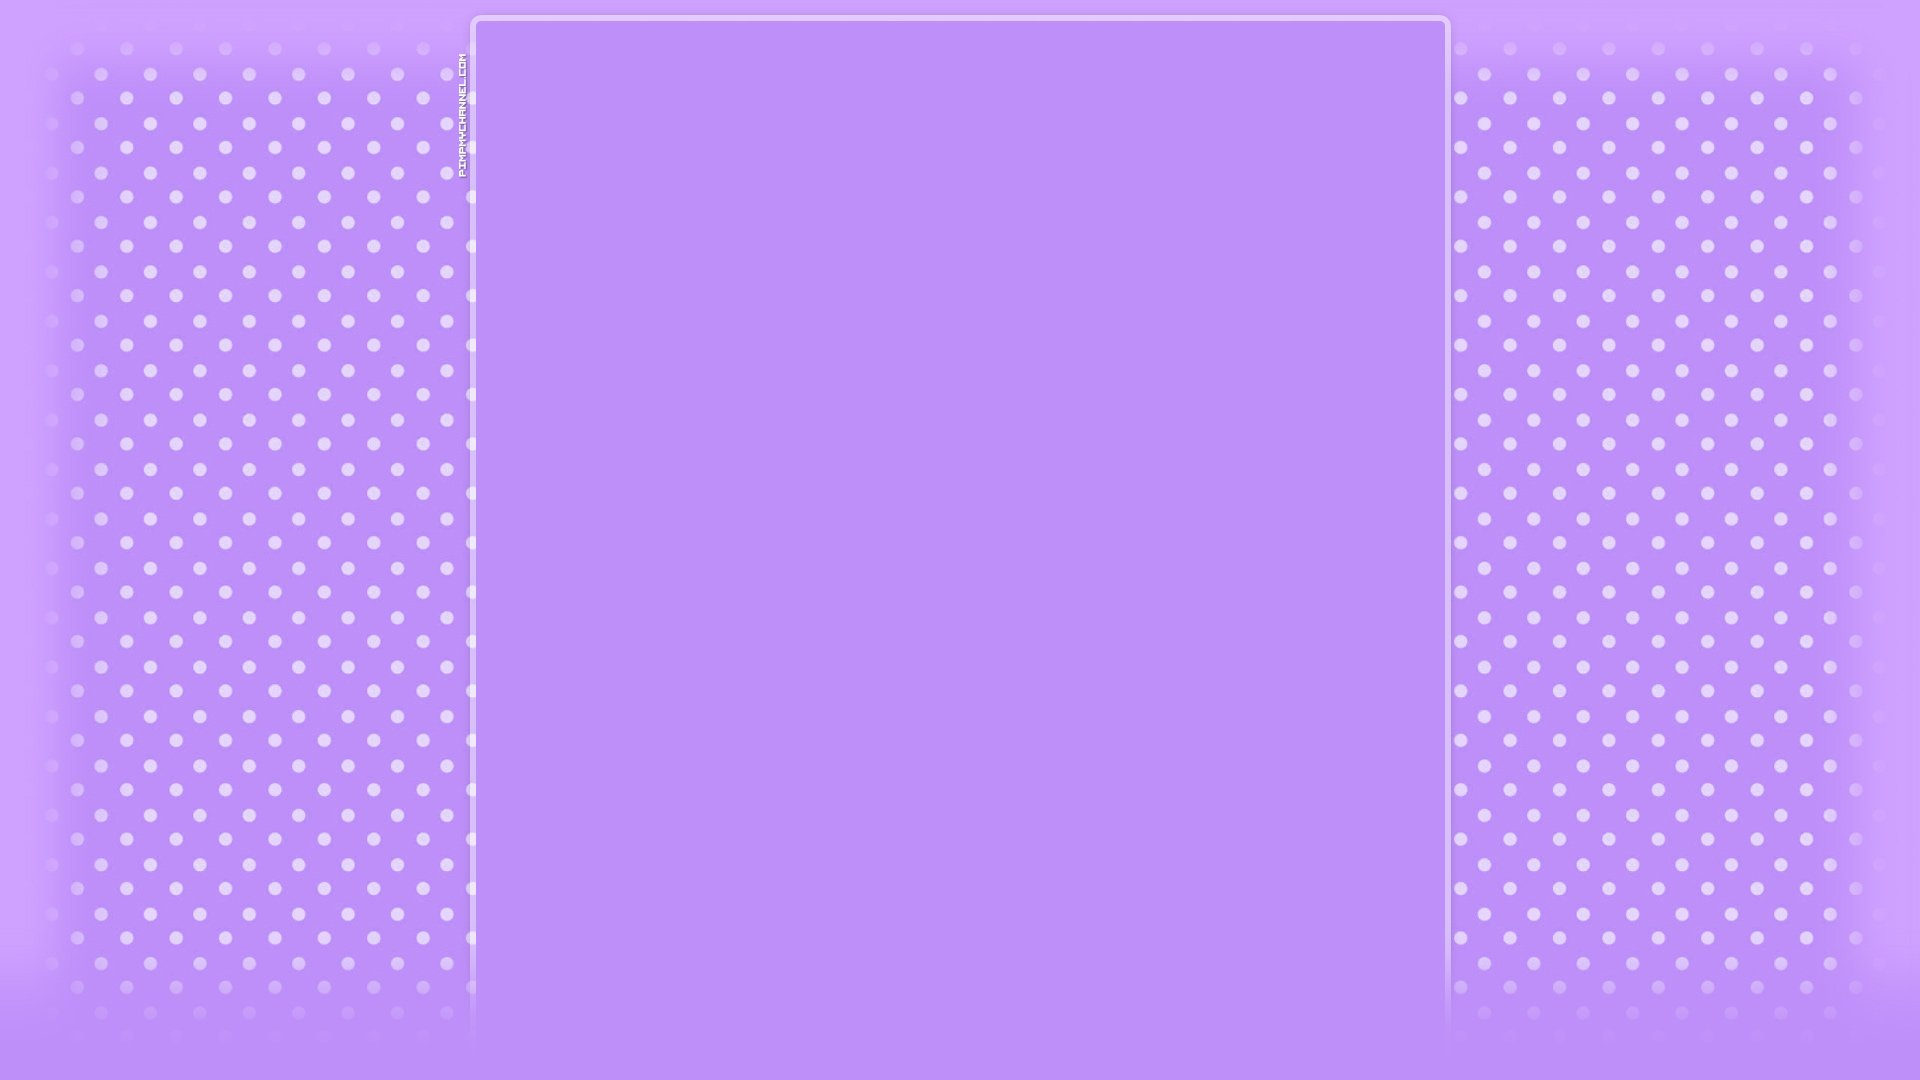 Pink Polka Dot Patterns Cute Polka Dot Wallpap...